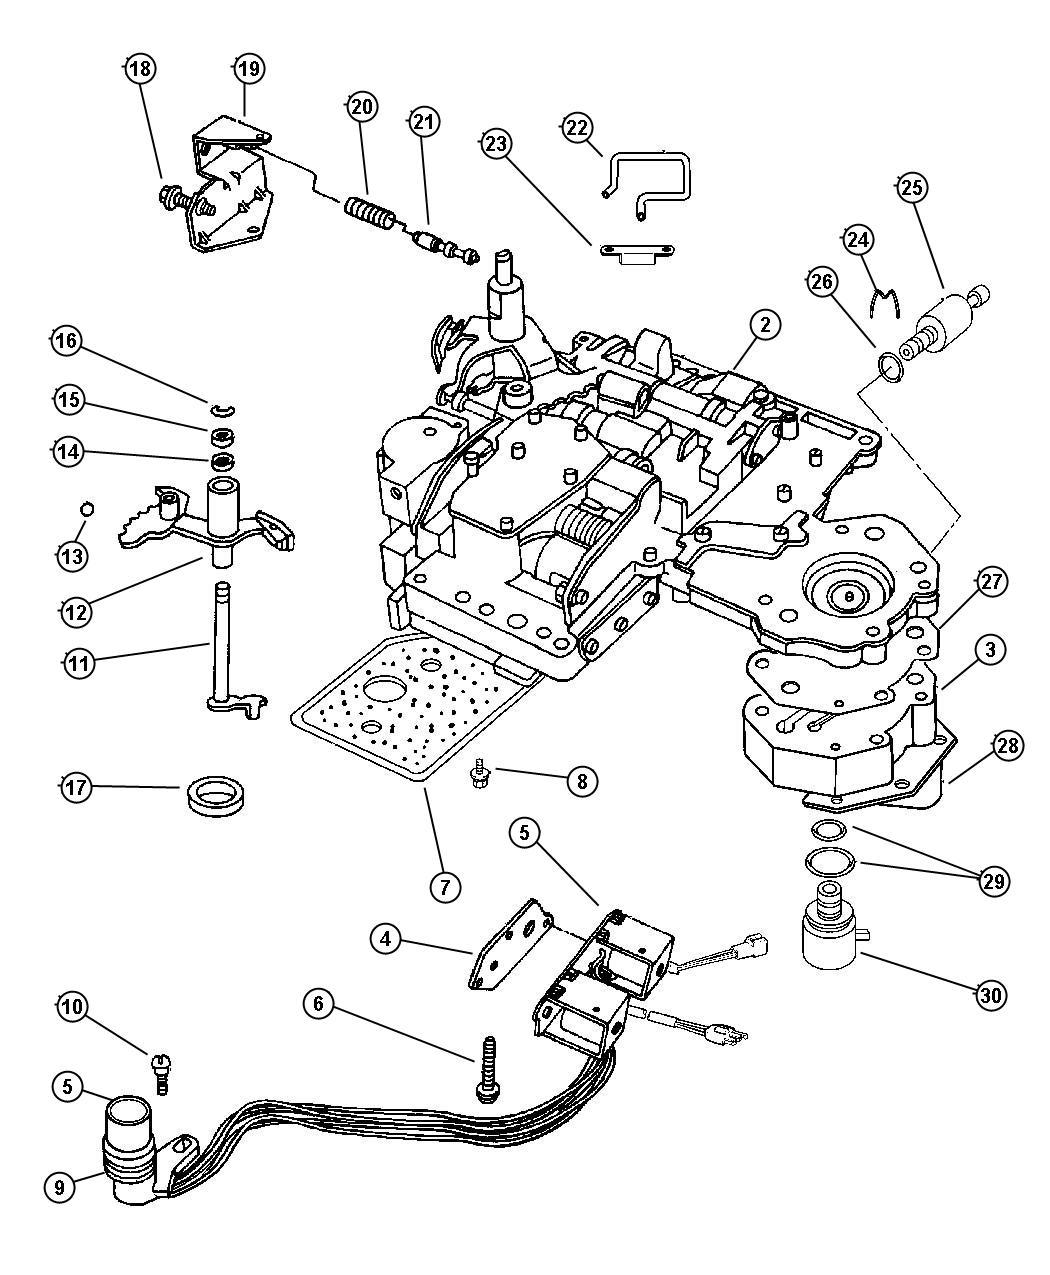 Showassembly on chrysler factory radio wiring diagram